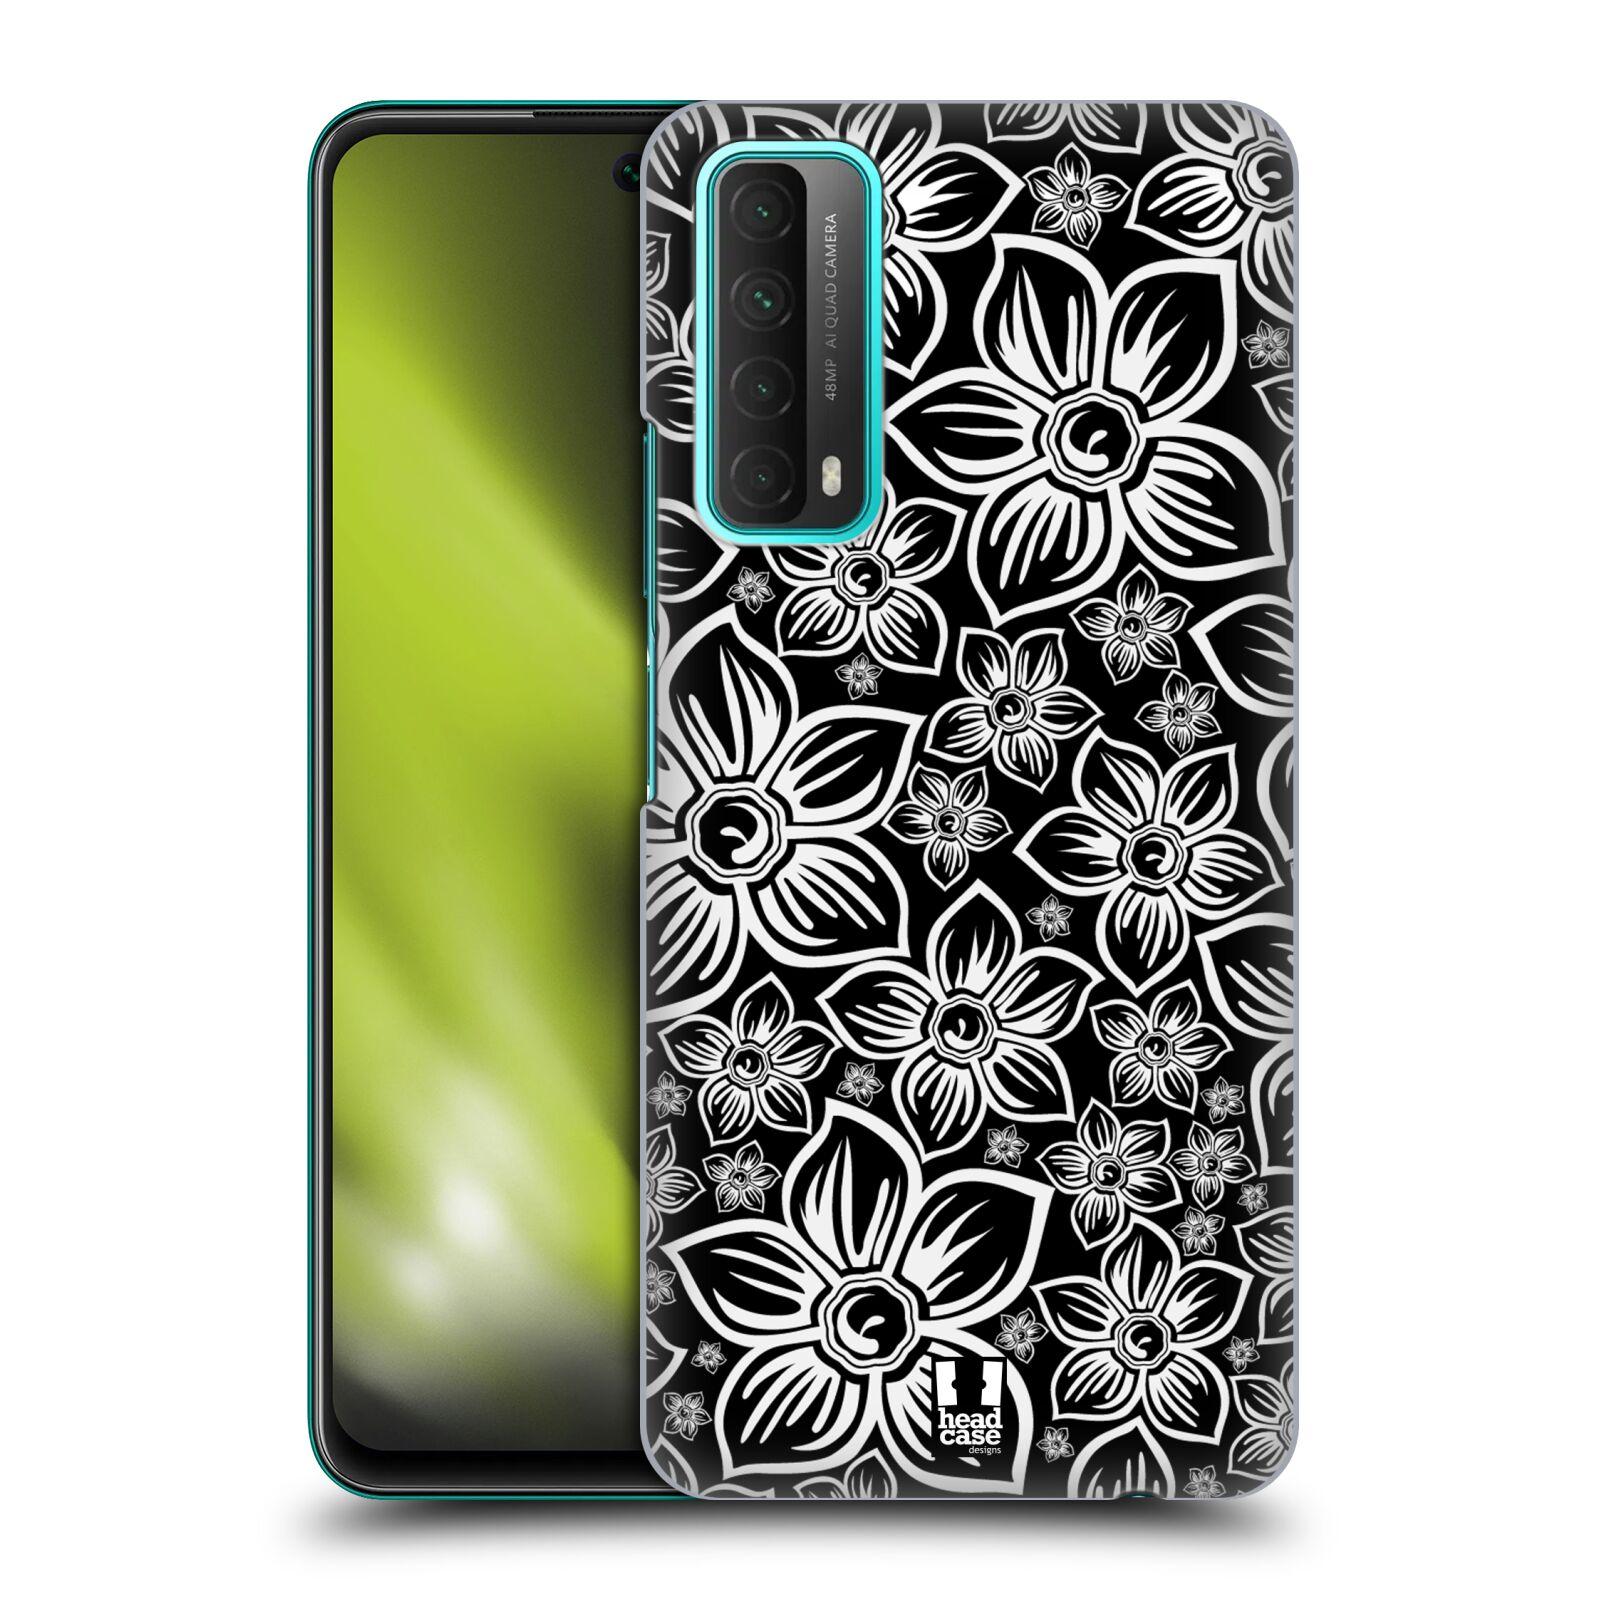 Plastové pouzdro na mobil Huawei P Smart (2021) - Head Case - FLORAL DAISY